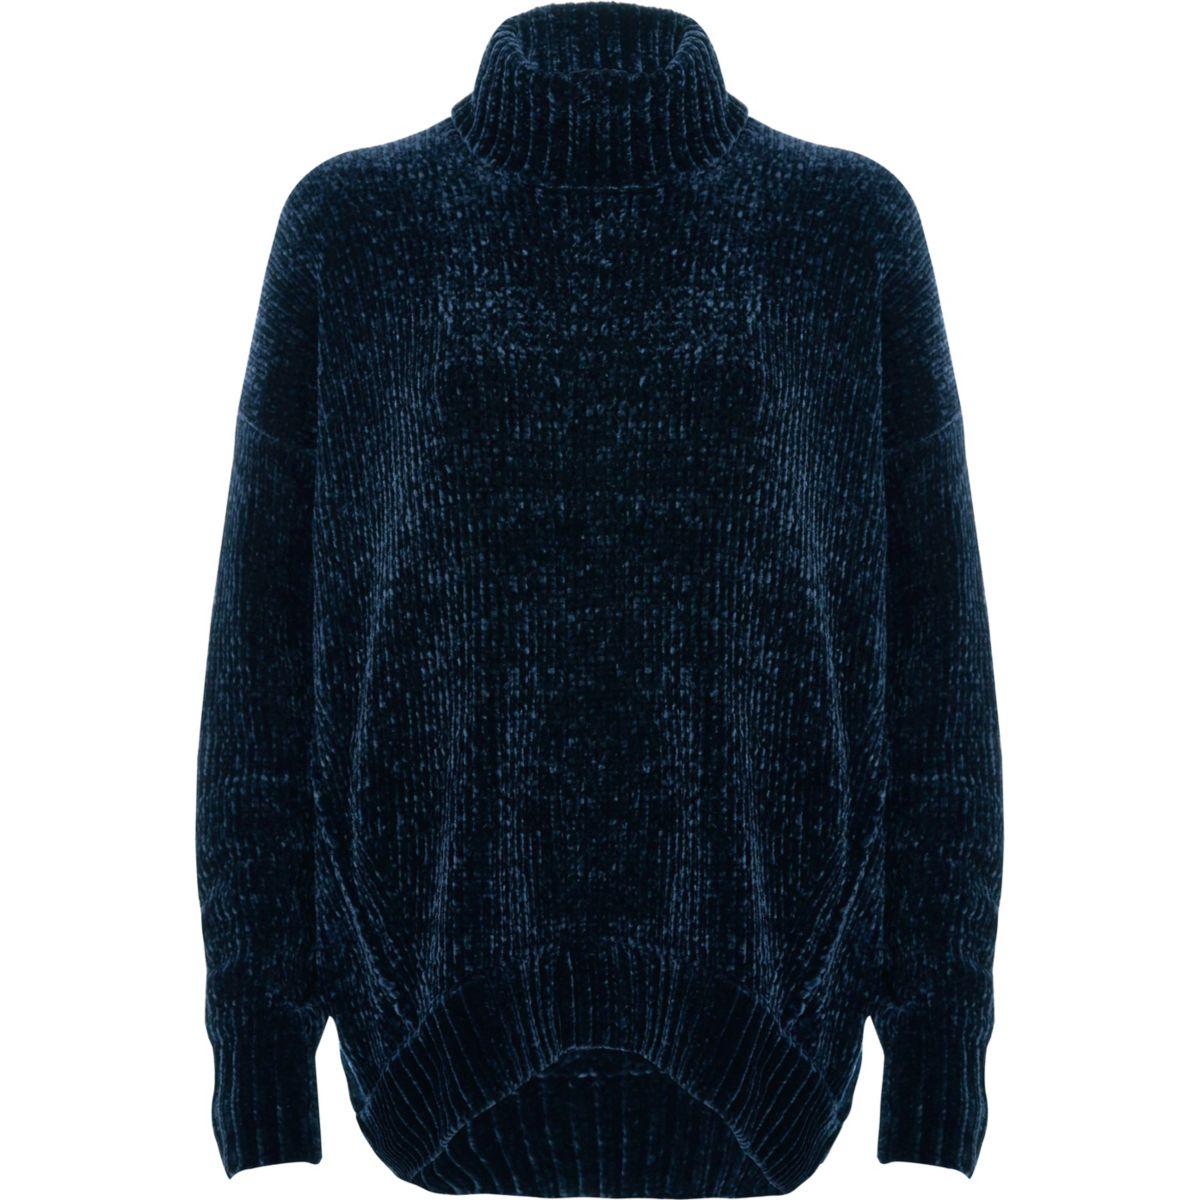 Navy chenille knit oversized roll neck jumper